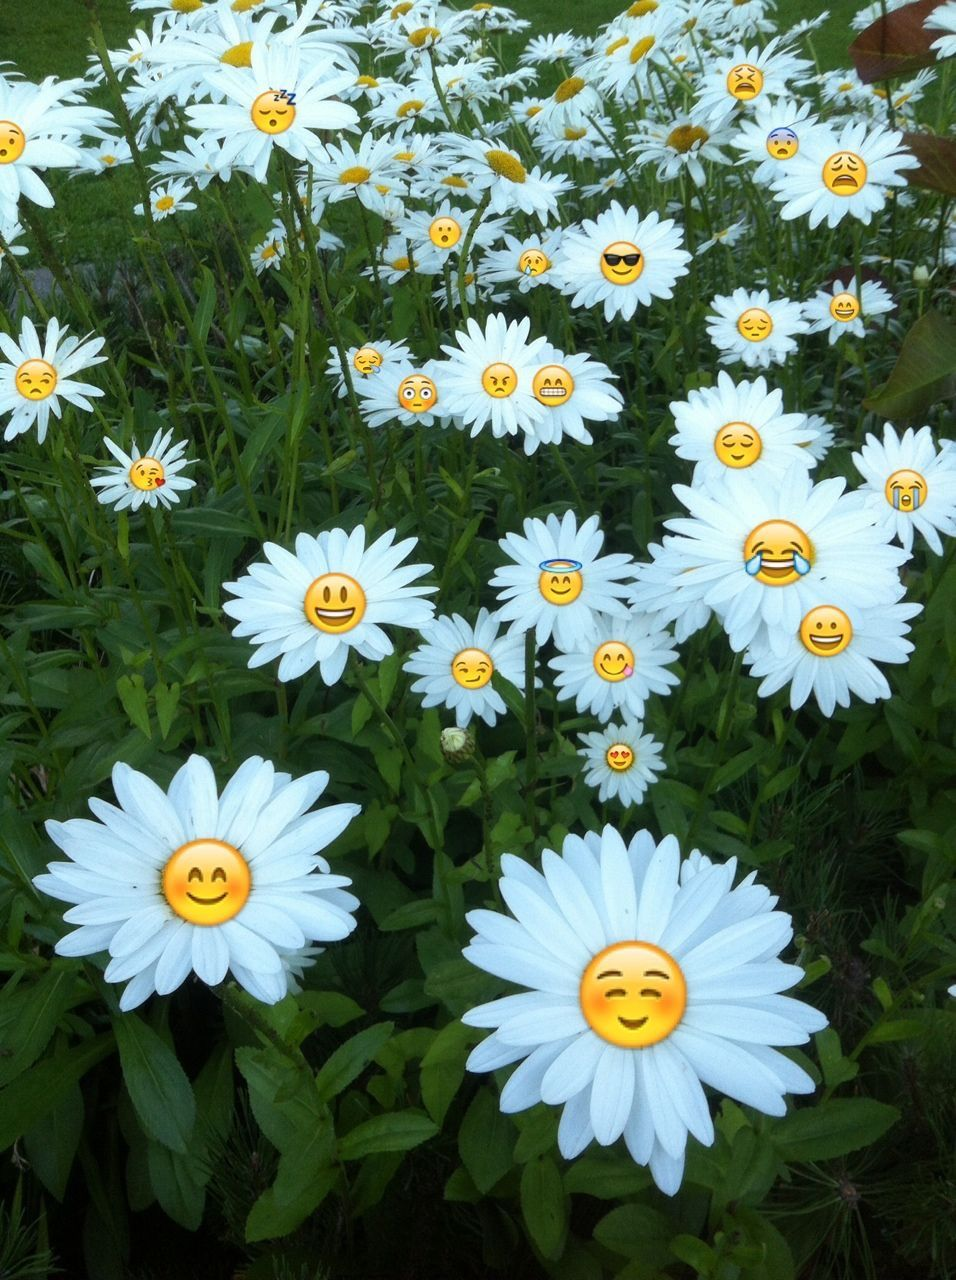 Pin by zehra on life pinterest explore emoji flower tumblr wallpaper and more izmirmasajfo